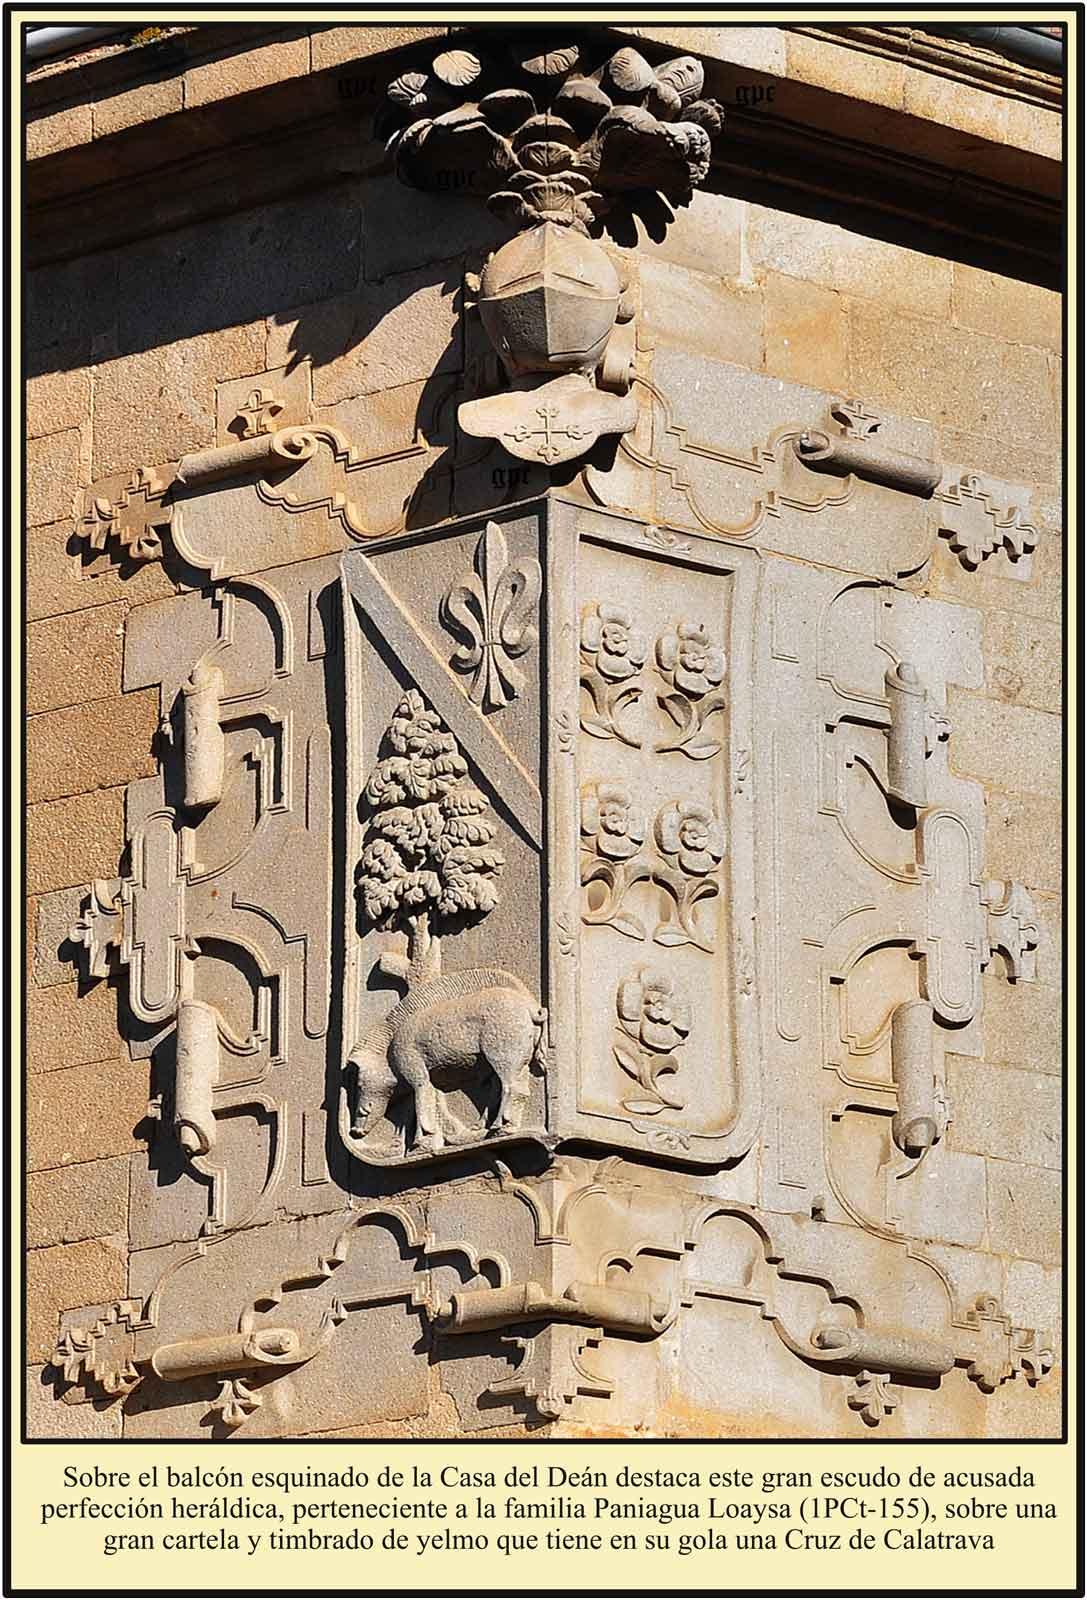 Plasencia Escudo de los Paniagua Loaysa sobre un balcon esquinado Plaza de la Catedral